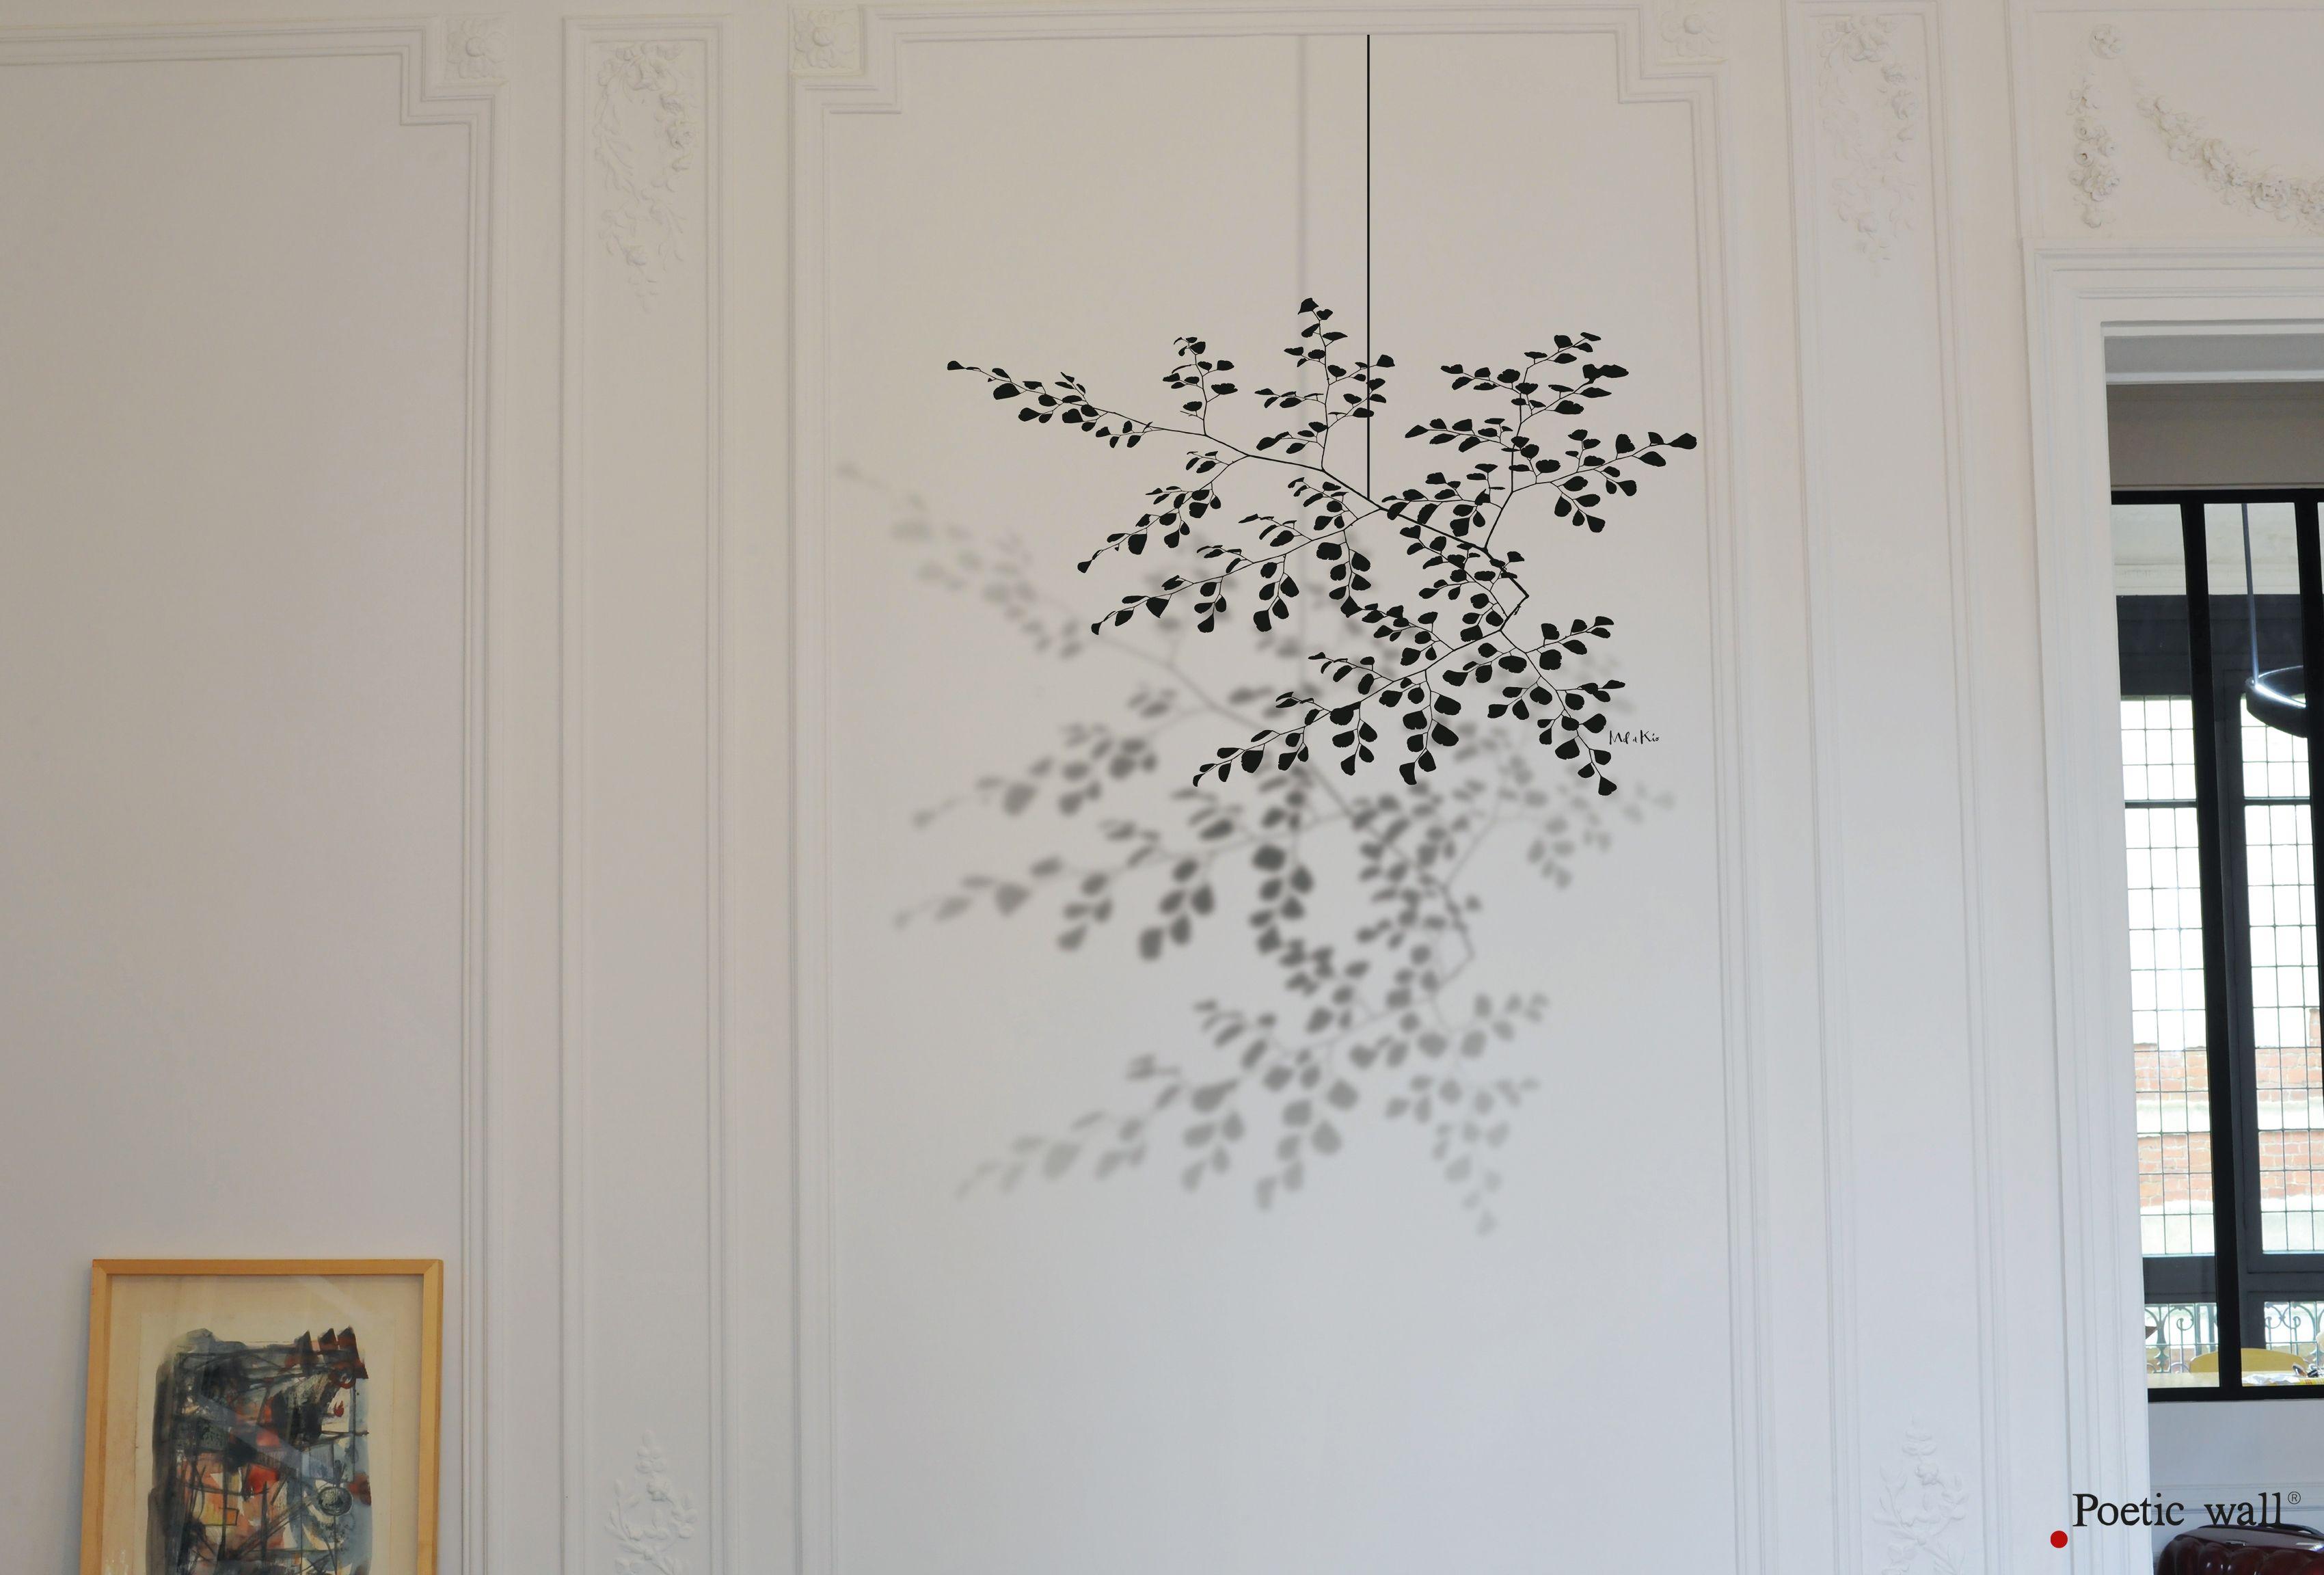 Poetic Wall Mel Et Kio poetic wall – murmures de l'ombre – stickers ombre xxl « le